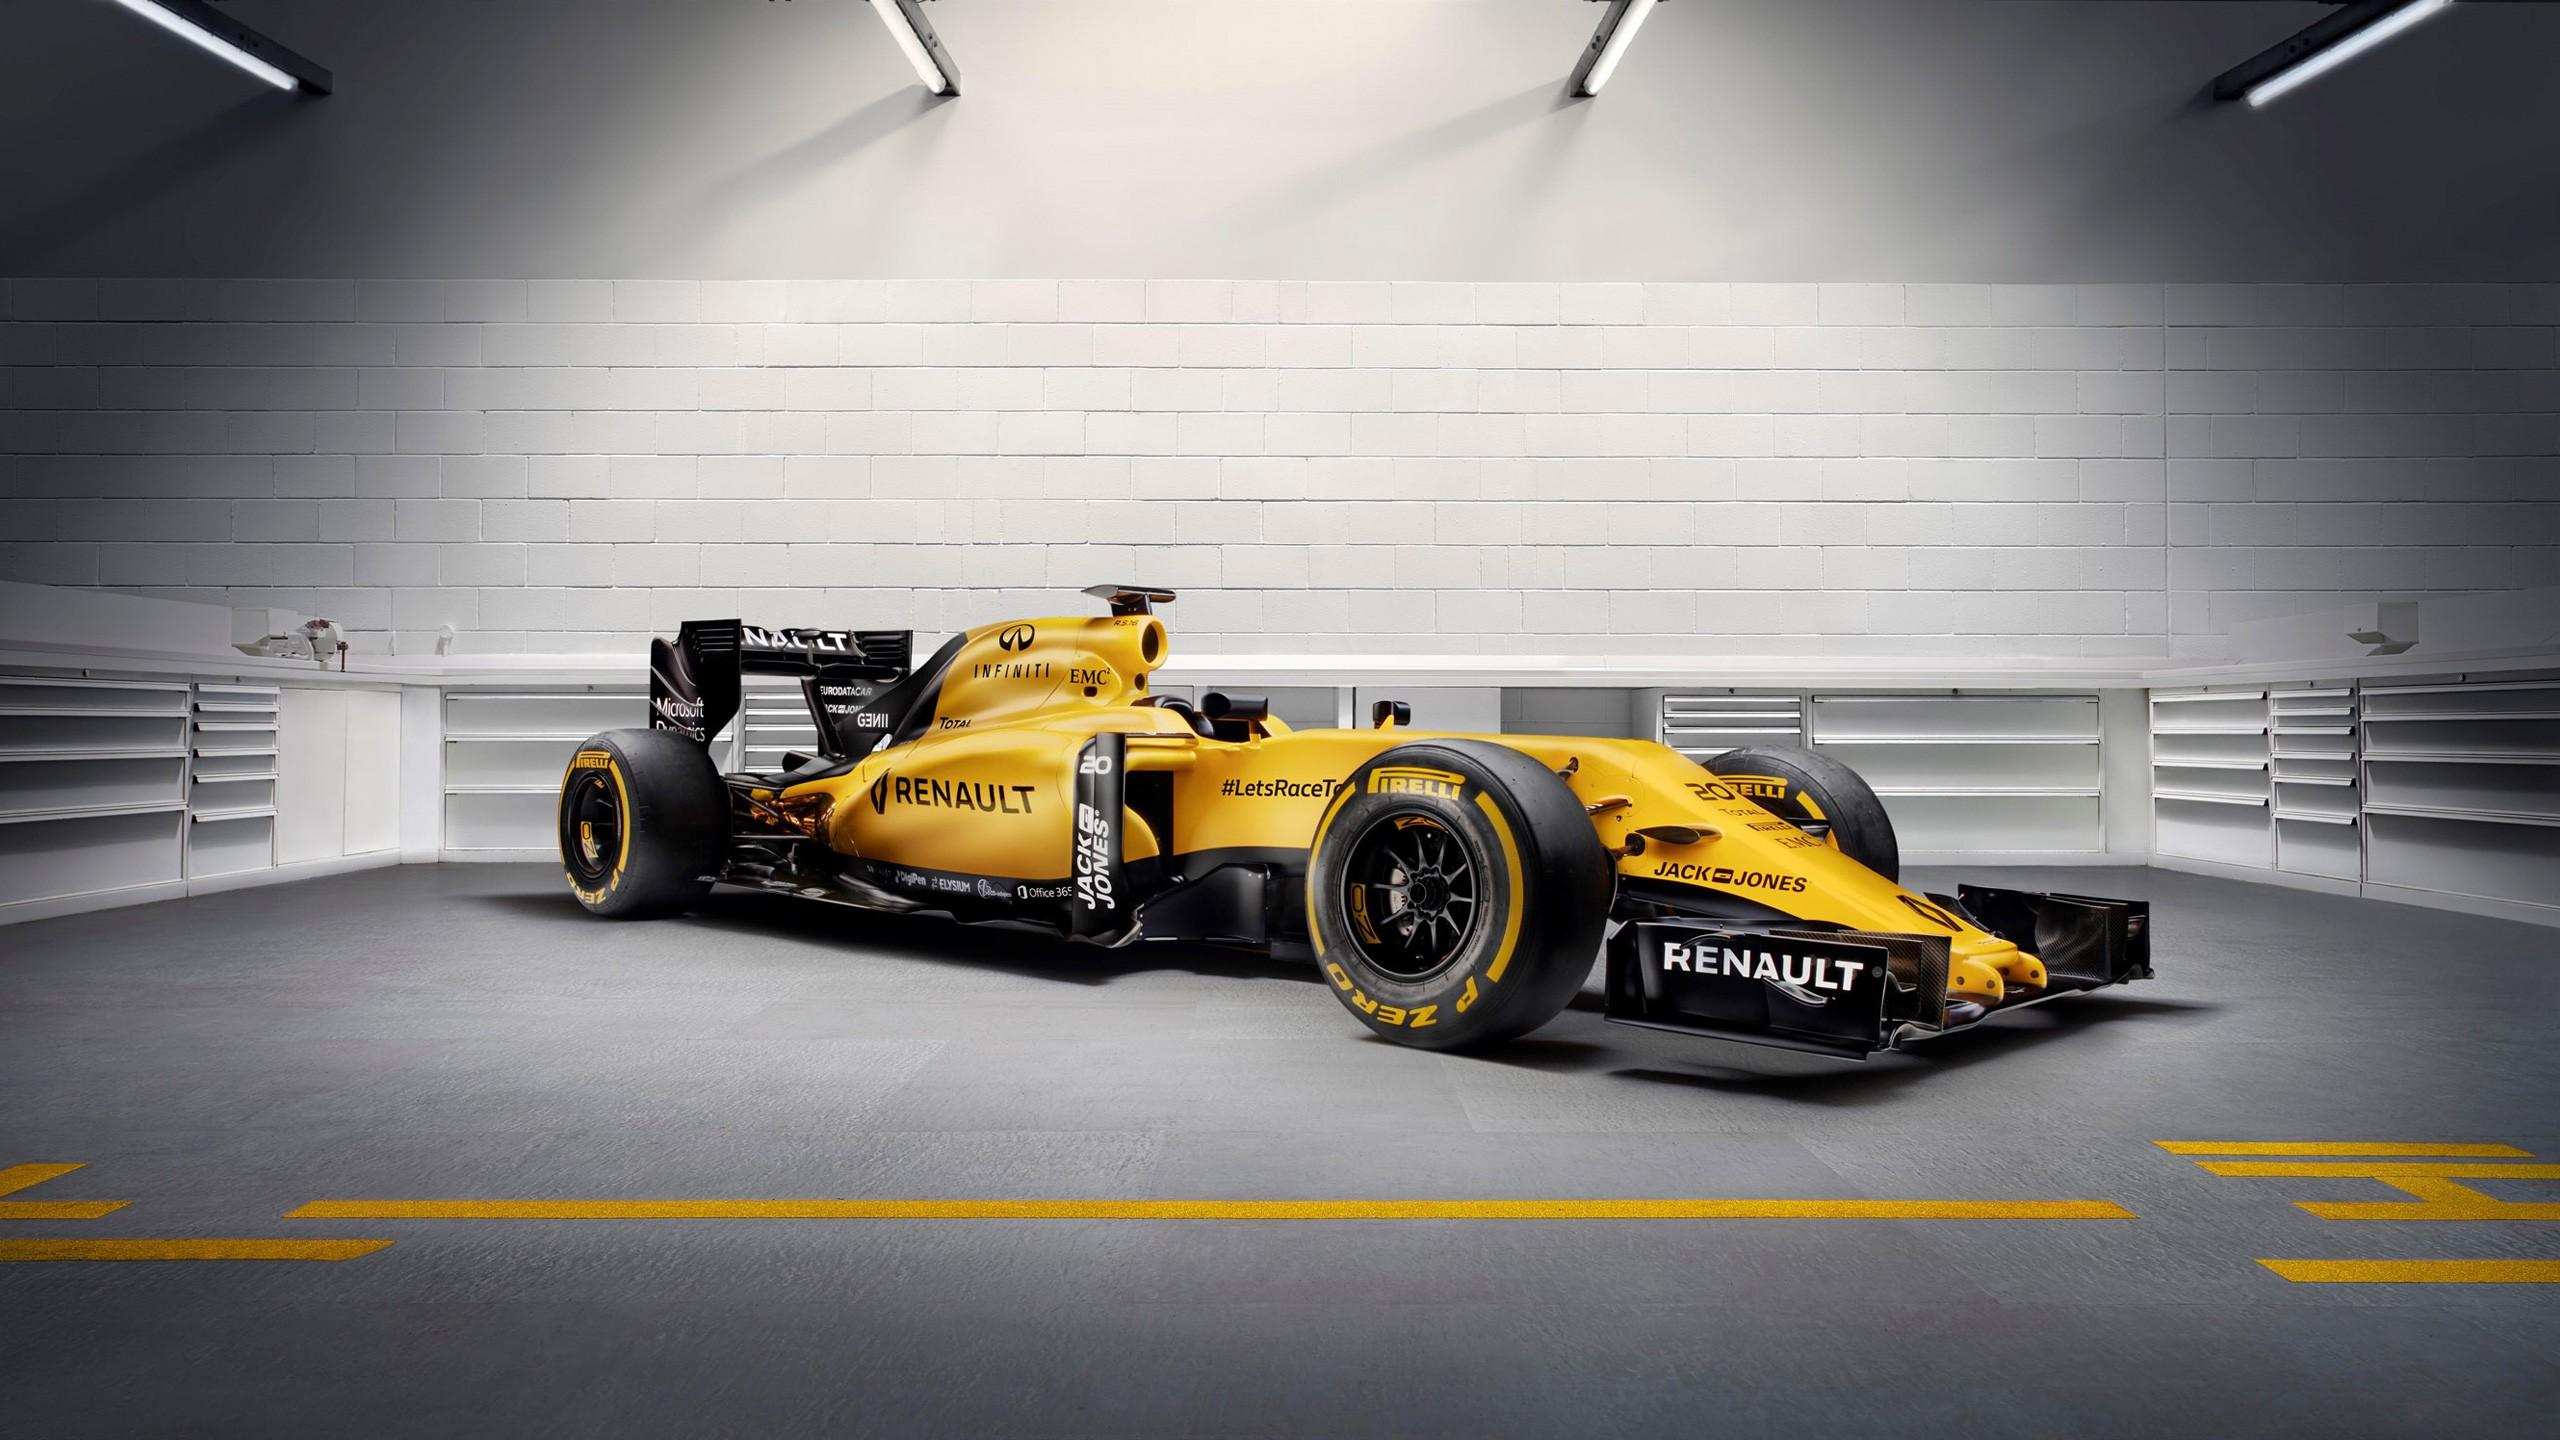 2016 Renault RS16 Formula 1 Wallpaper | HD Car Wallpapers | ID #6320